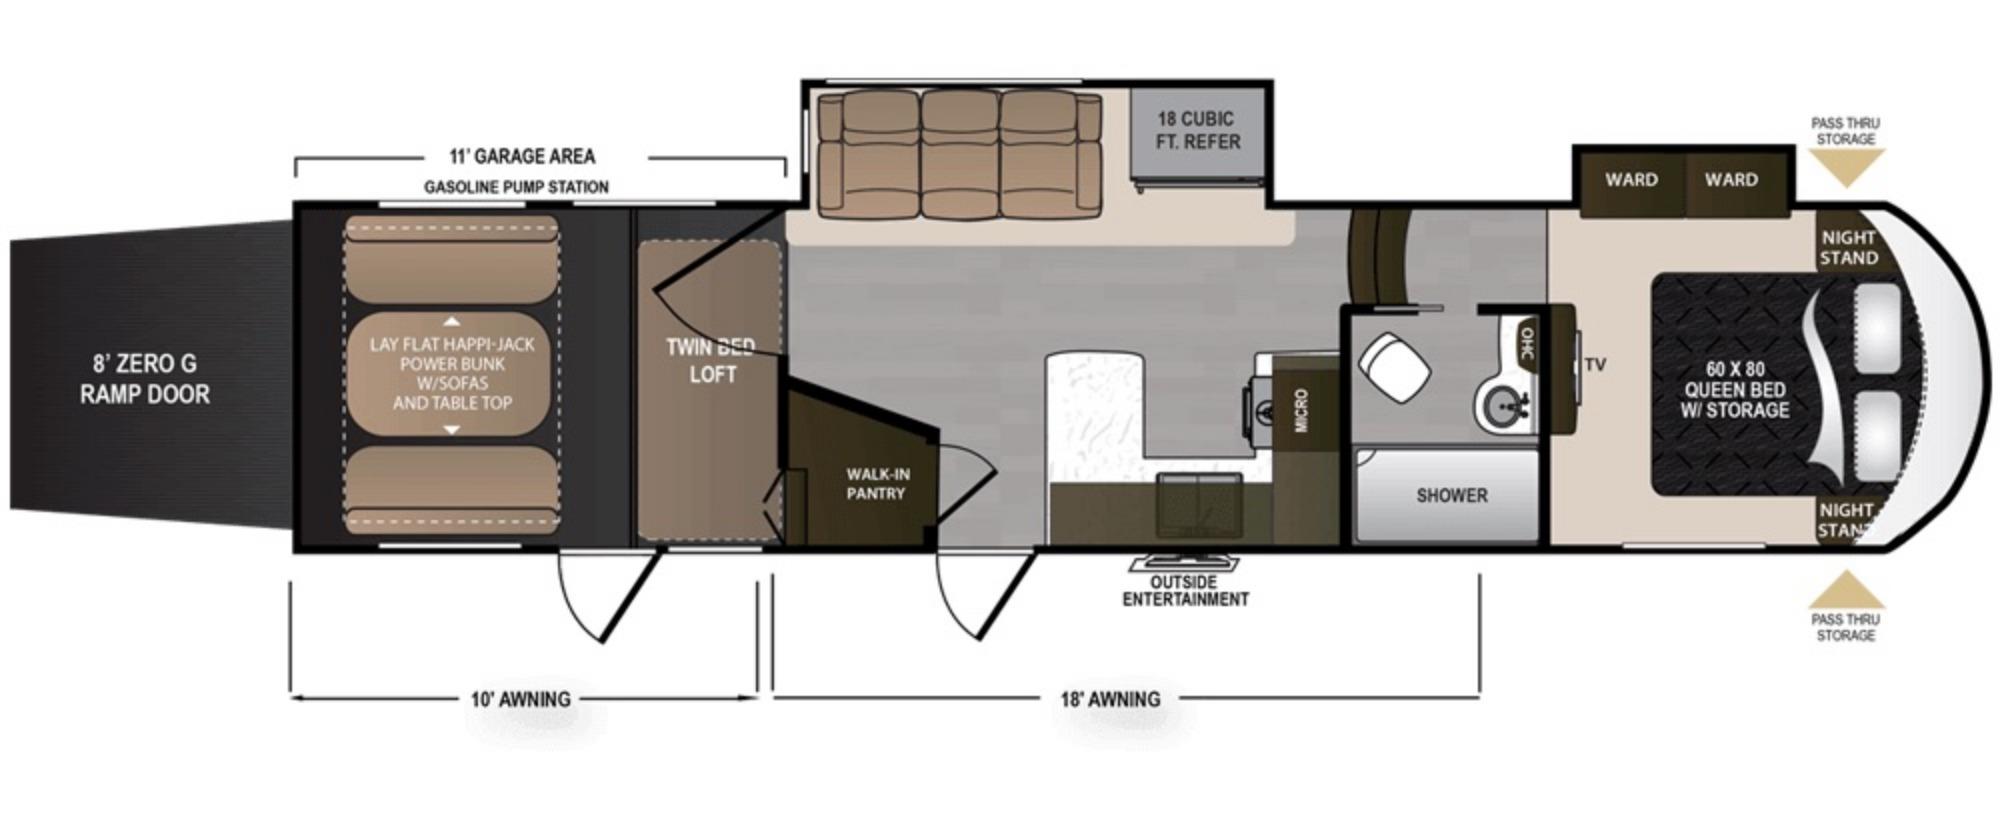 View Floor Plan for 2019 DUTCHMEN VOLTAGE 3705